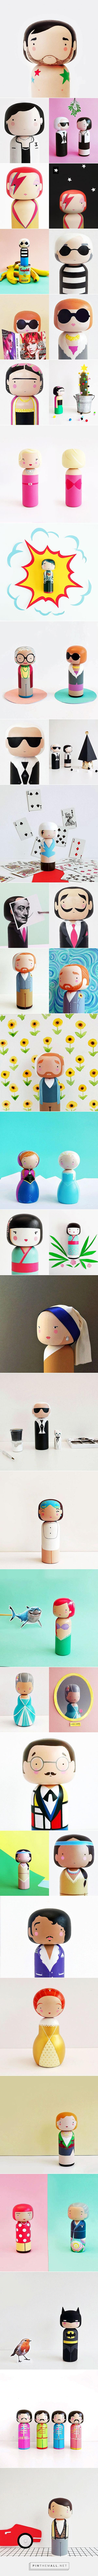 Cultural Icons as Kokeshi Dolls | Hint Fashion  Magazine - created via https://pinthemall.net